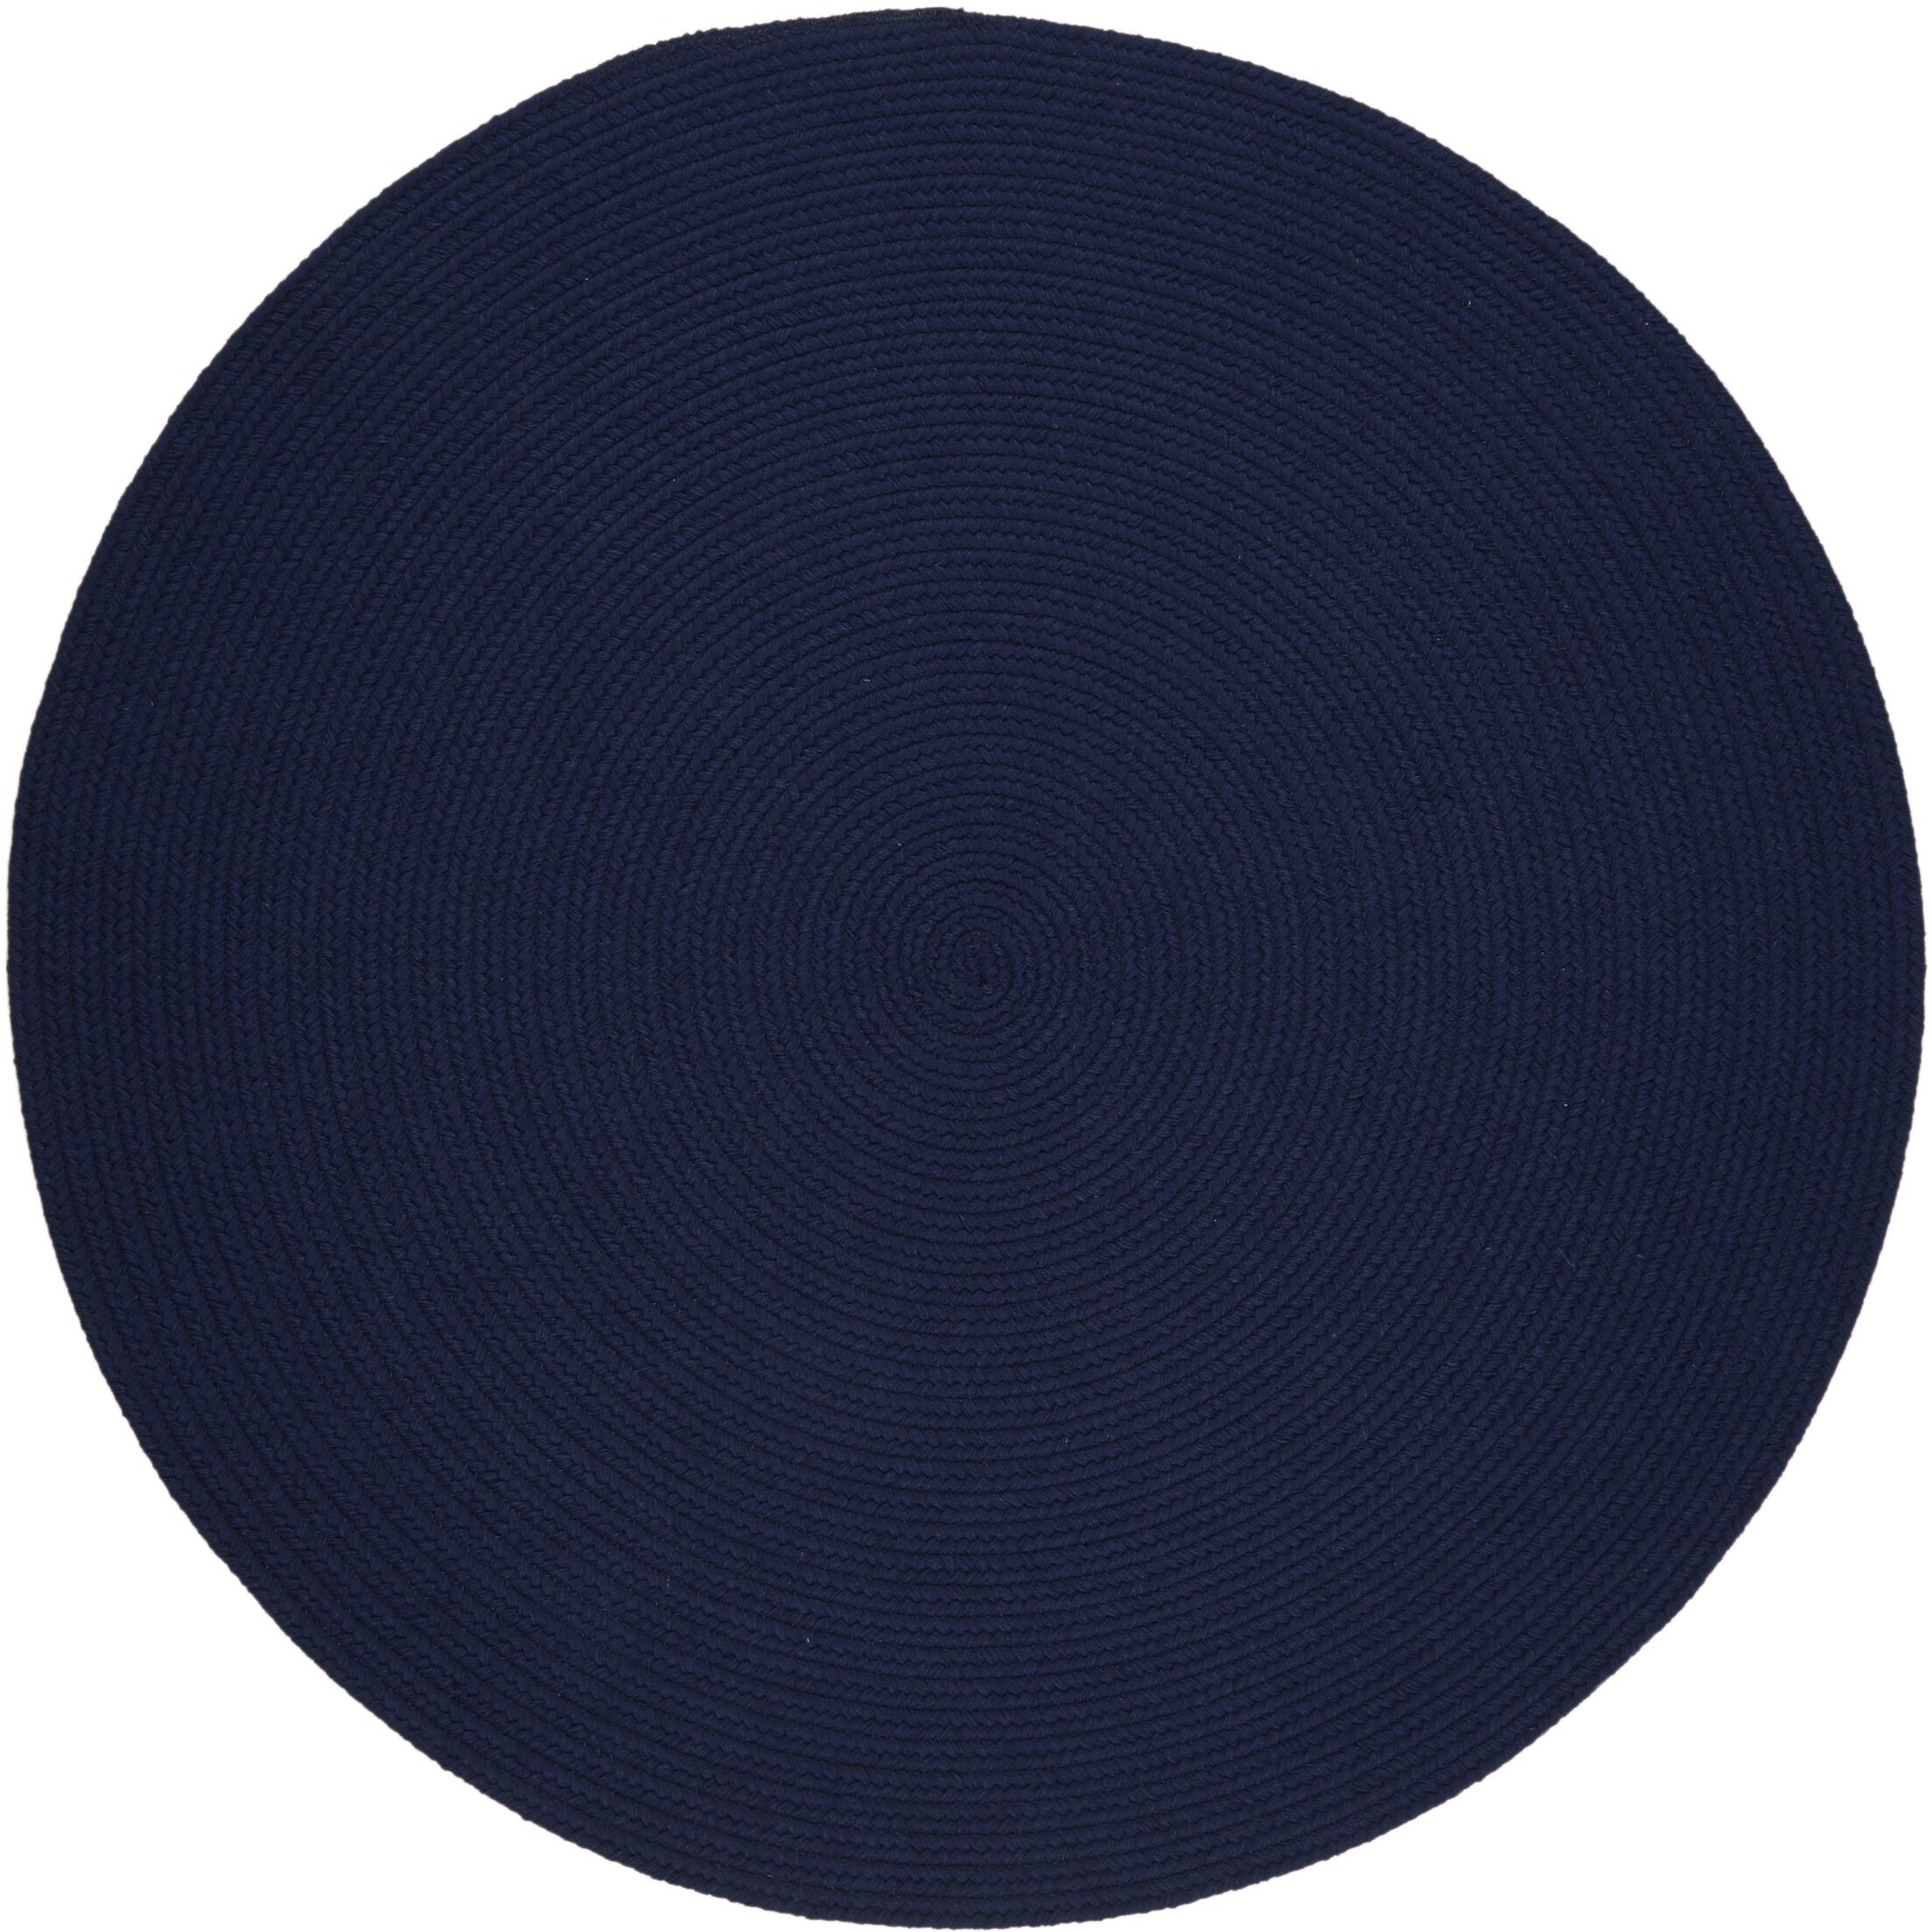 Handmade Navy Area Rug Rug Size: Round 10'